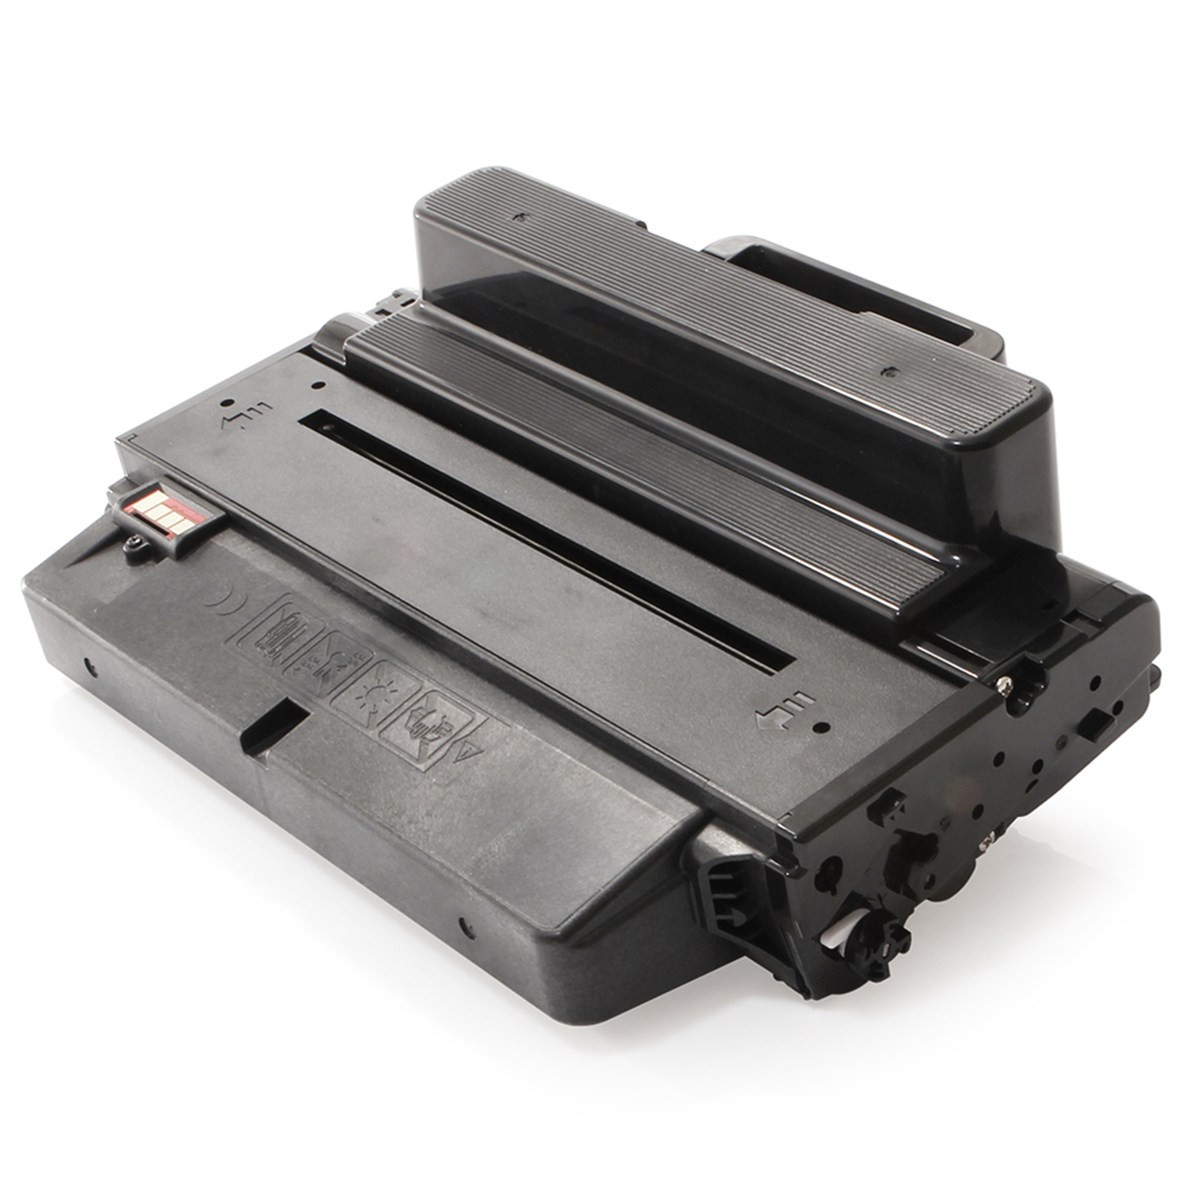 Toner Compatível com Xerox Workcentre WC3325 WC3315 Phaser 3320 | 106R02310 | Bestchoice 5k